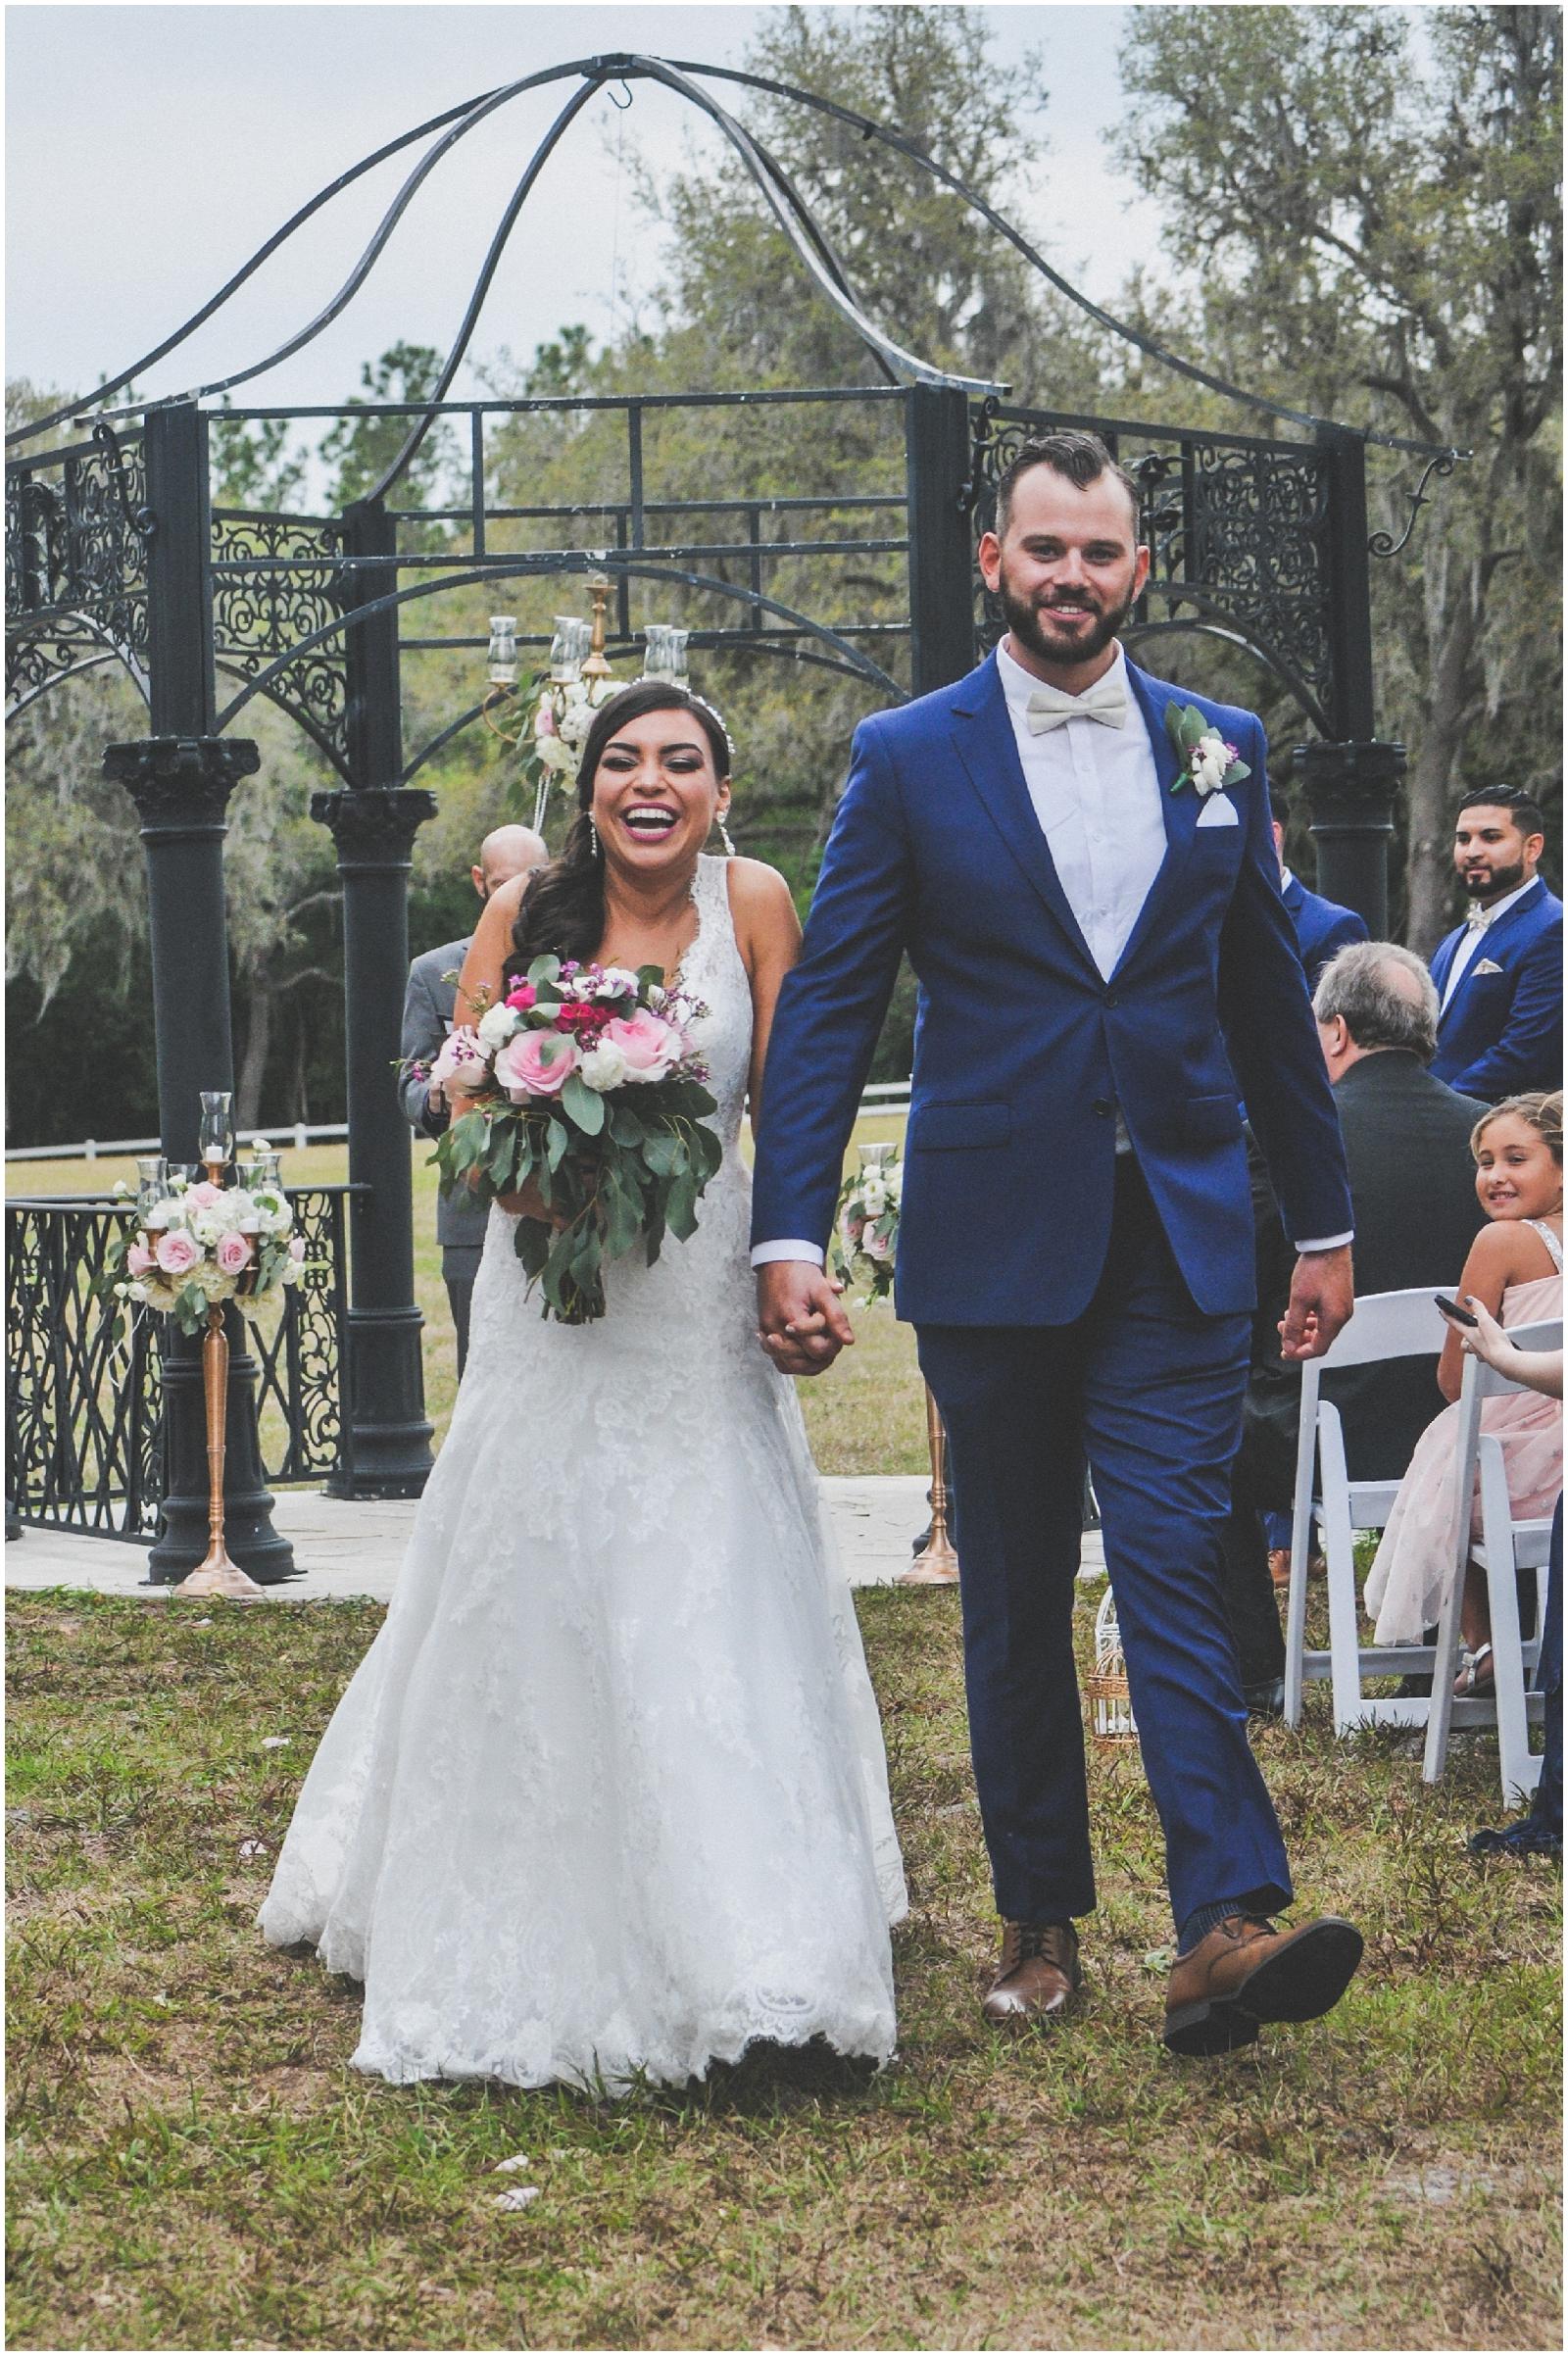 Rustic-Elegant-Wedding-Venue-in-Tampa-Stonebridge-Events_0430.jpg